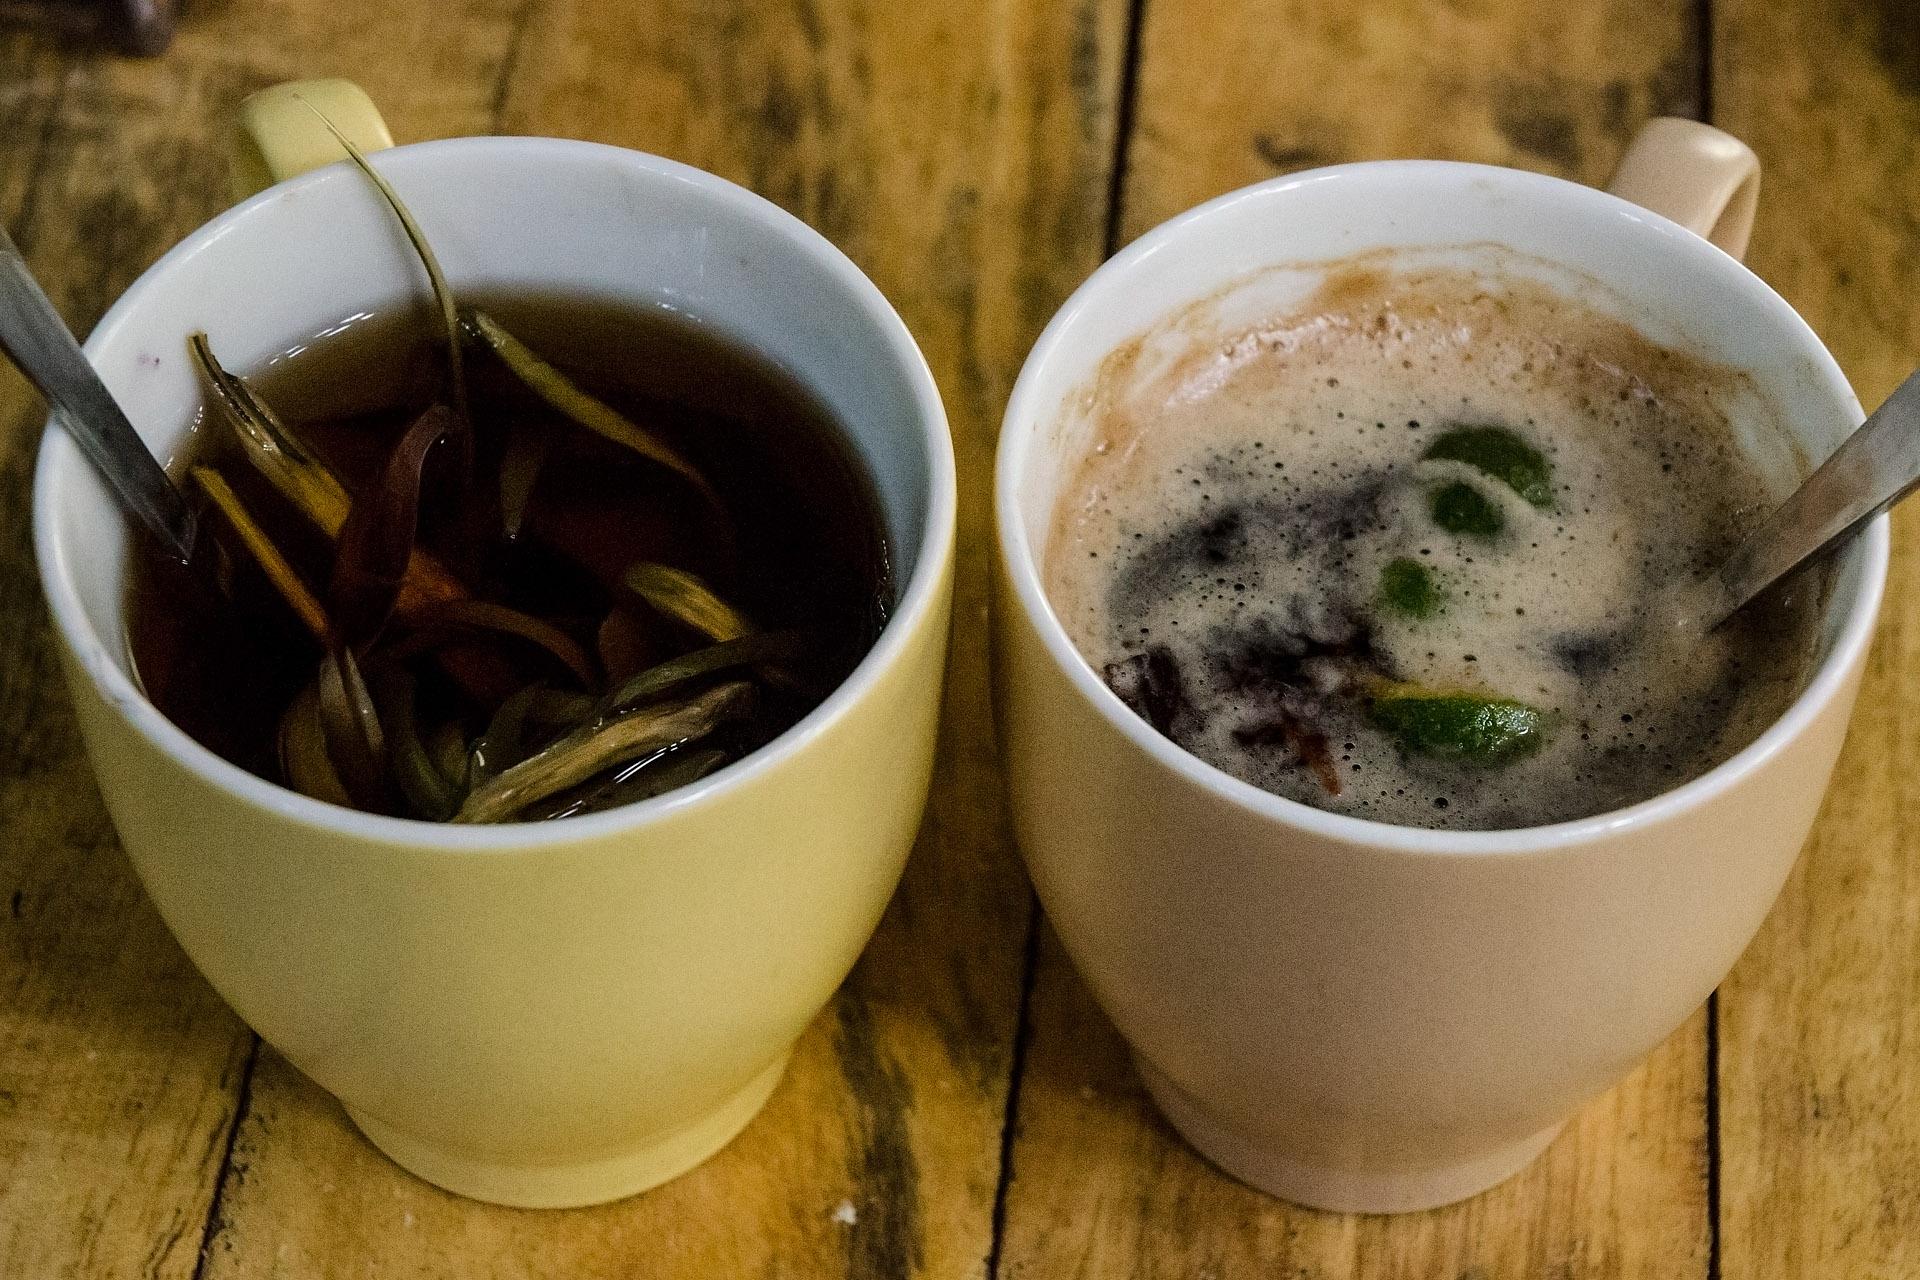 Artichoke tea, coffee cherry tea w/ kumquat & cinnamon